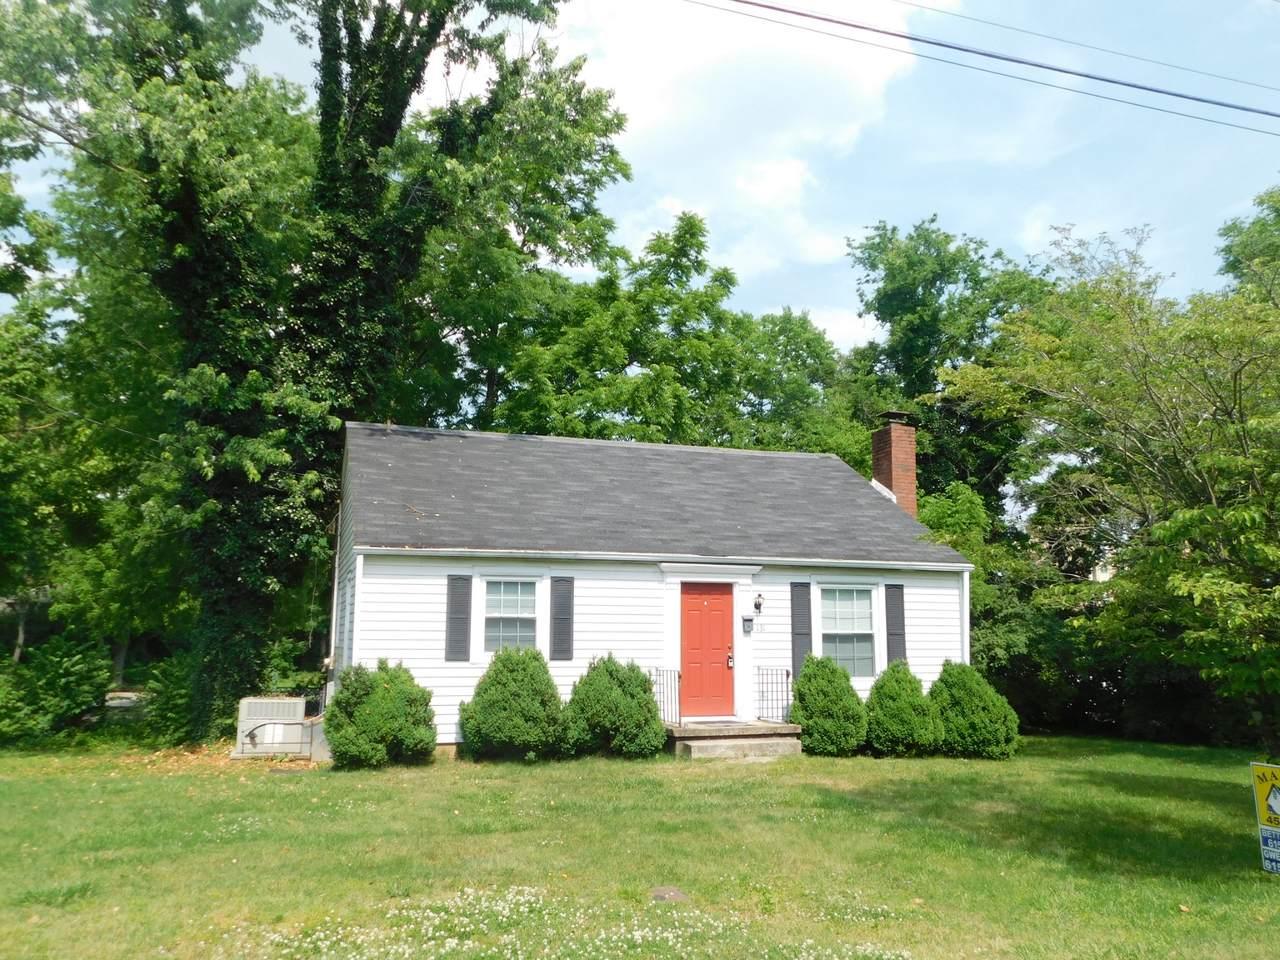 131 N Westland Ave - Photo 1